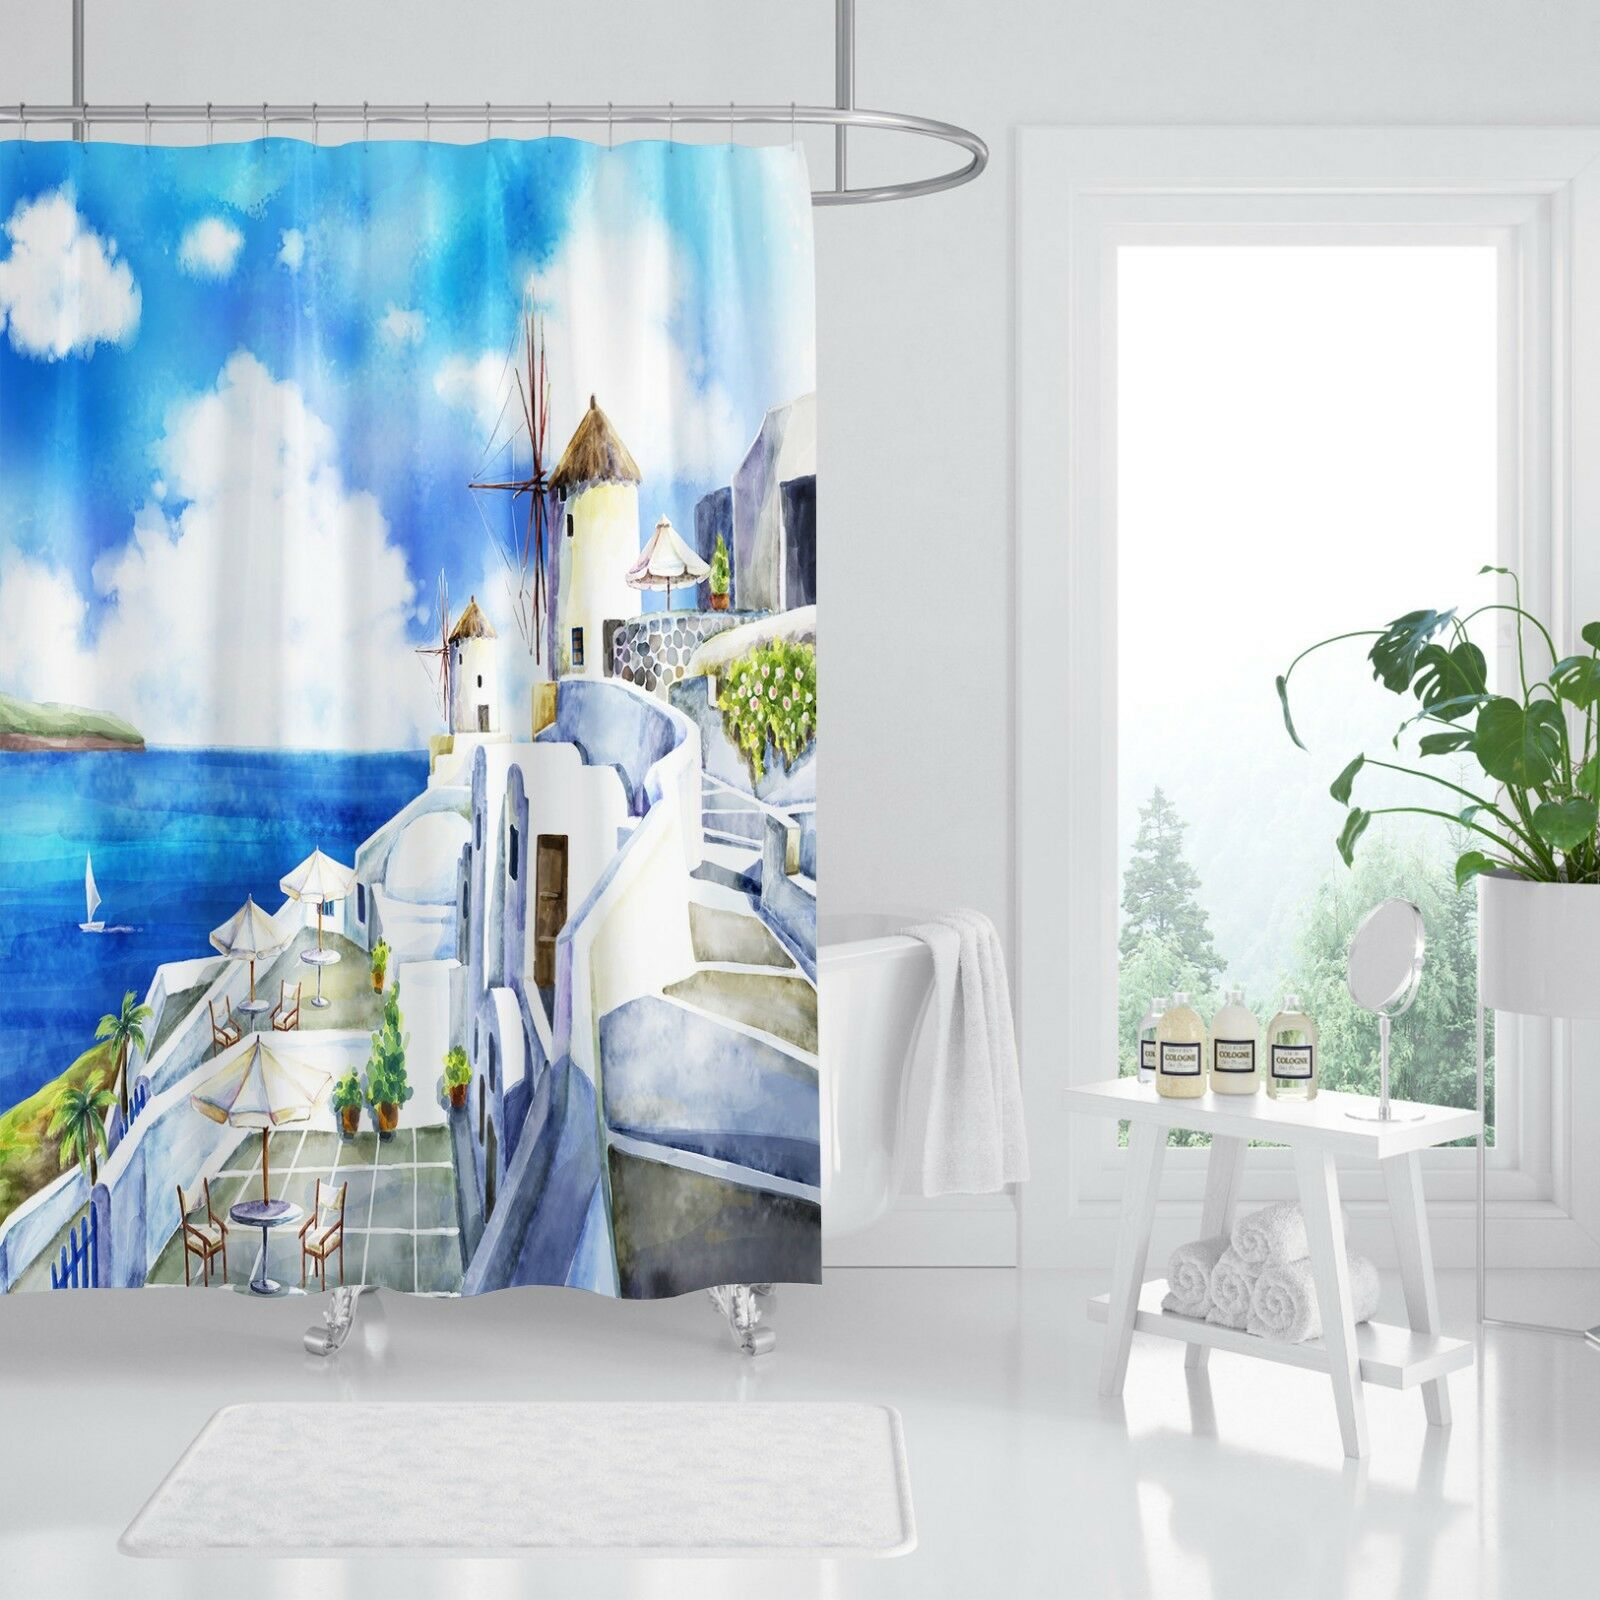 3D Sea House 5 Shower Curtain Waterproof Fiber Bathroom Home Windows Toilet